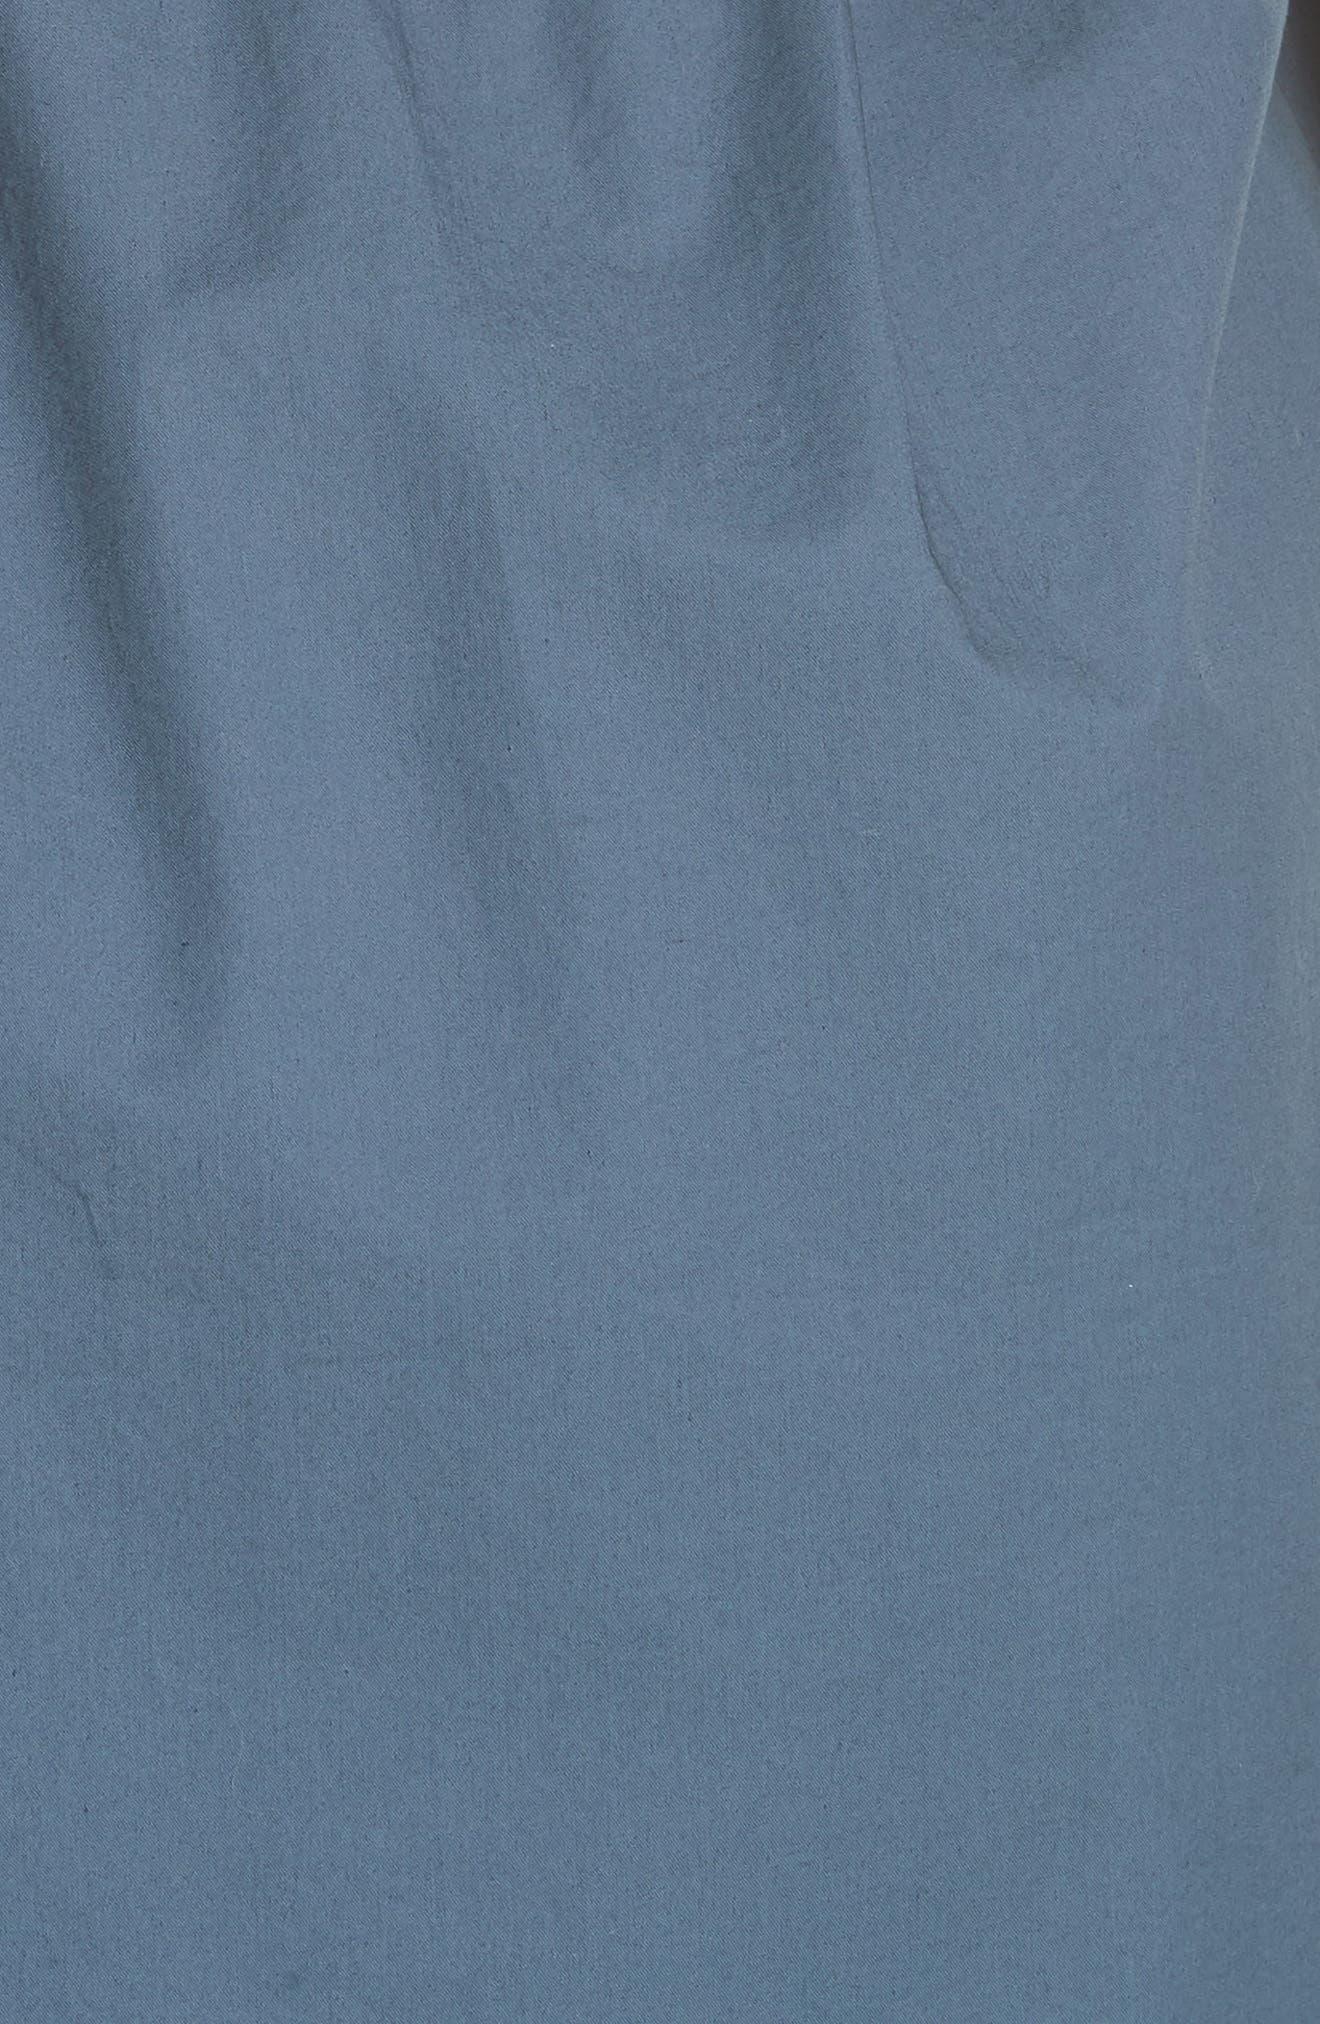 Poplin Shirtdress,                             Alternate thumbnail 5, color,                             434